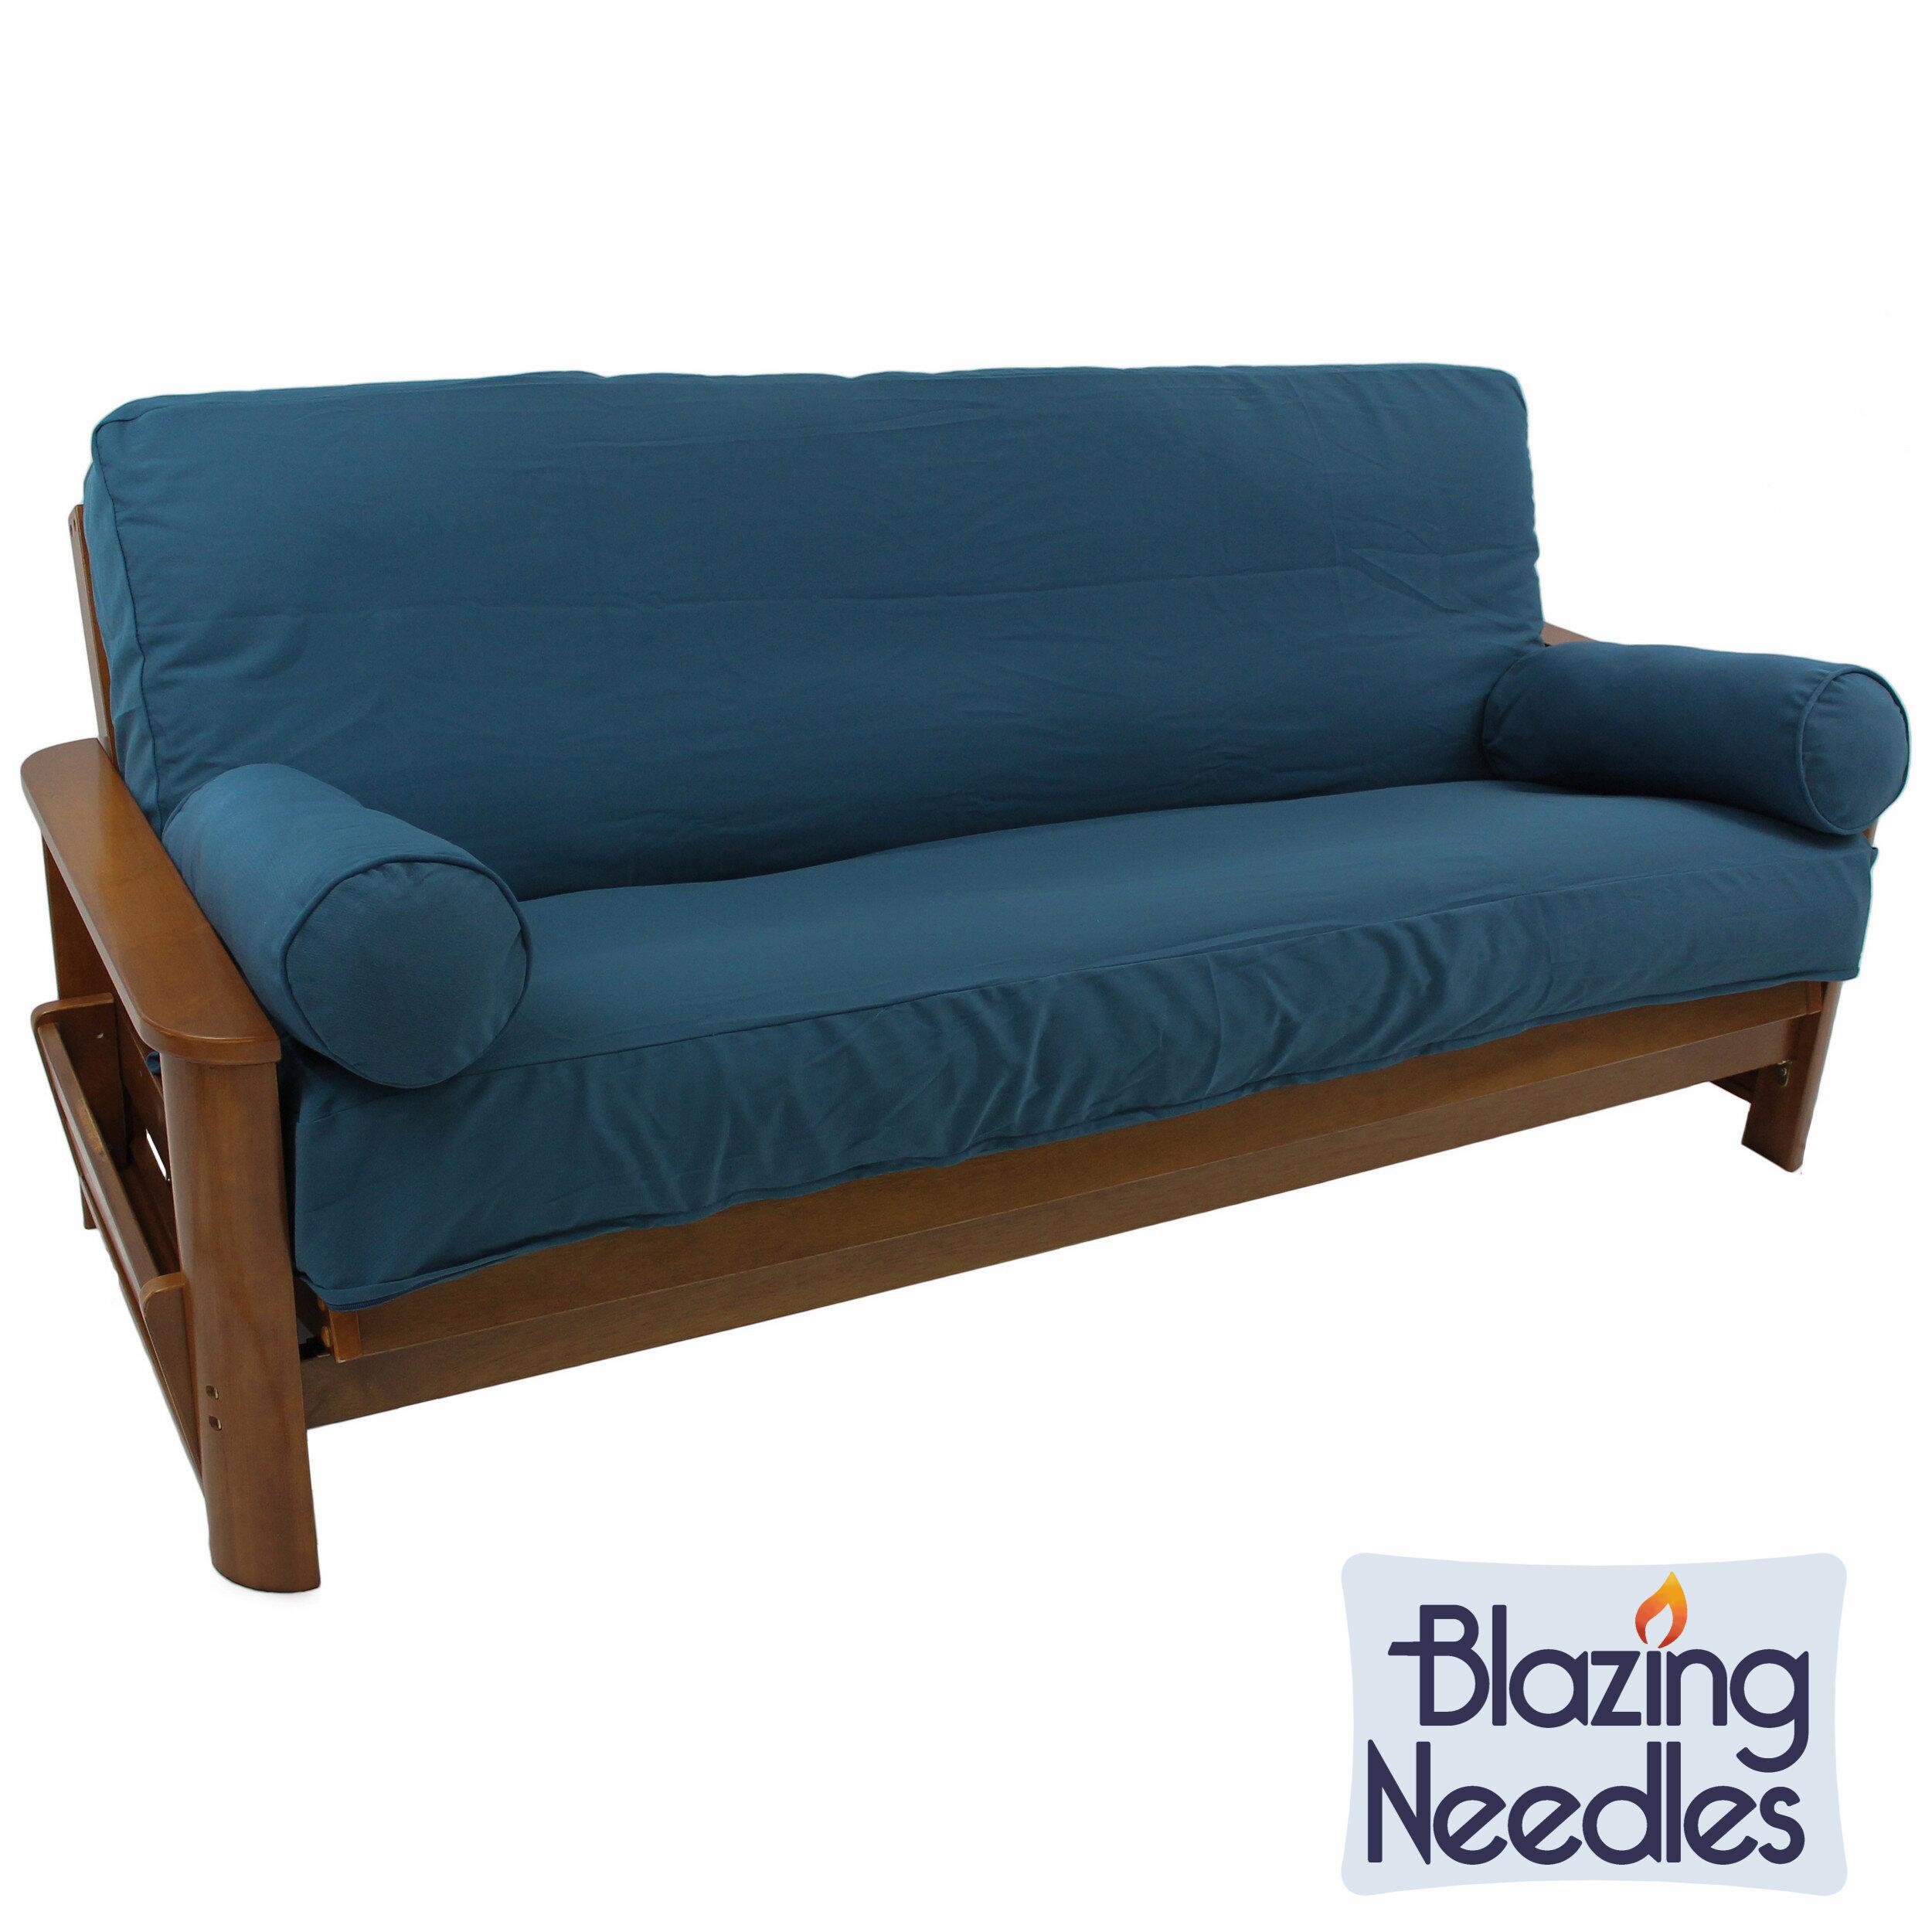 blazing needles premium box cushion futon slipcover set  u0026 reviews   wayfair blazing needles premium box cushion futon slipcover set  u0026 reviews      rh   wayfair